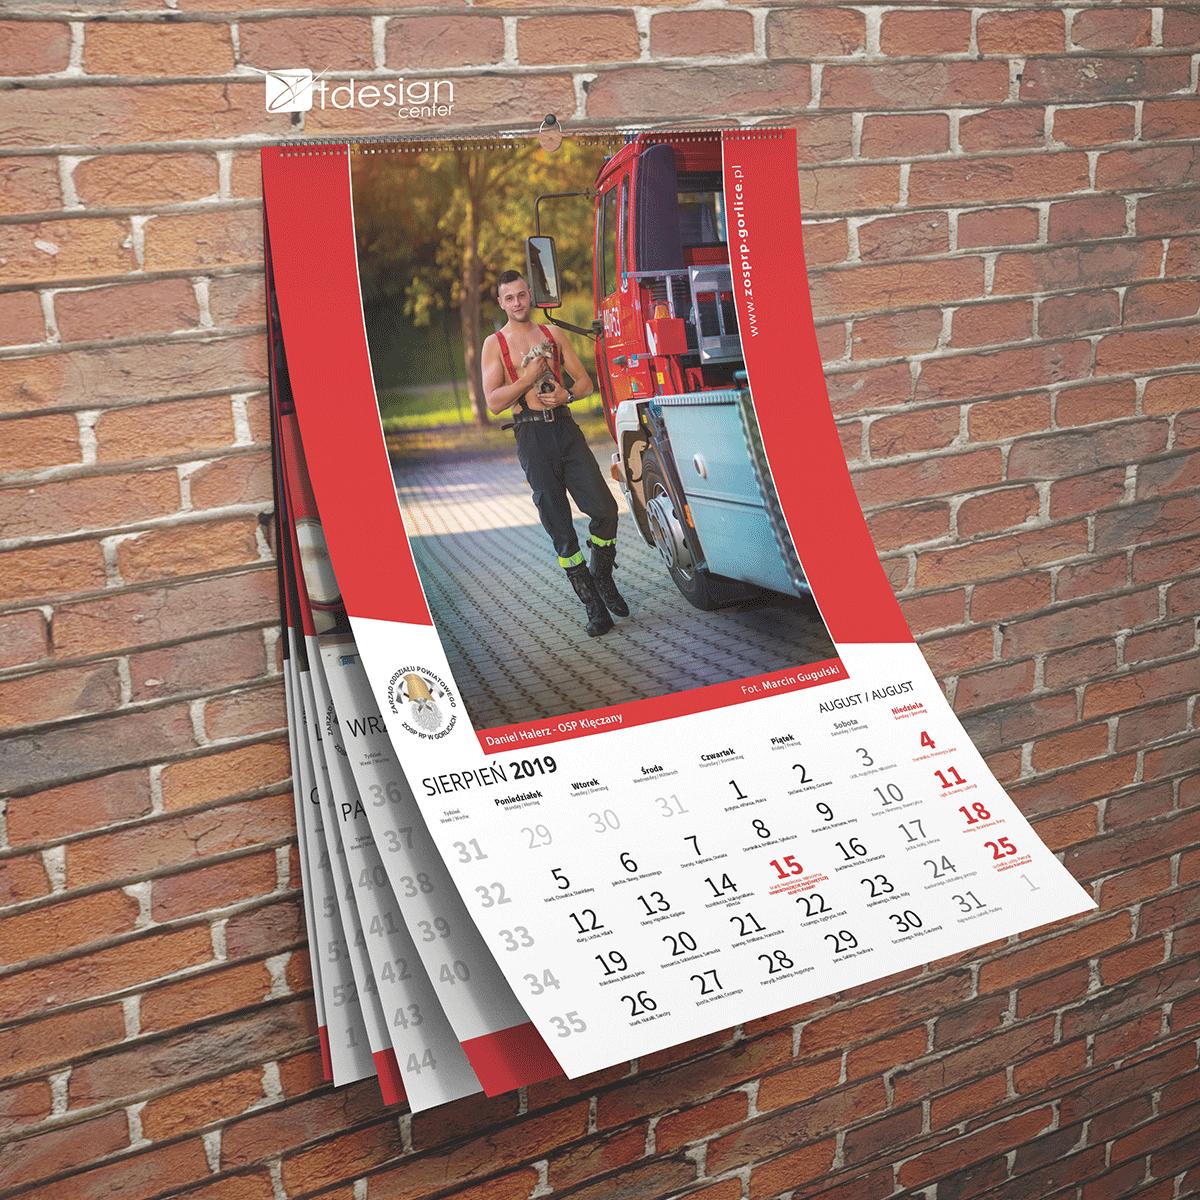 Kalendarz ścienny A3, spiralowany, 2019 rok, projekt + druk